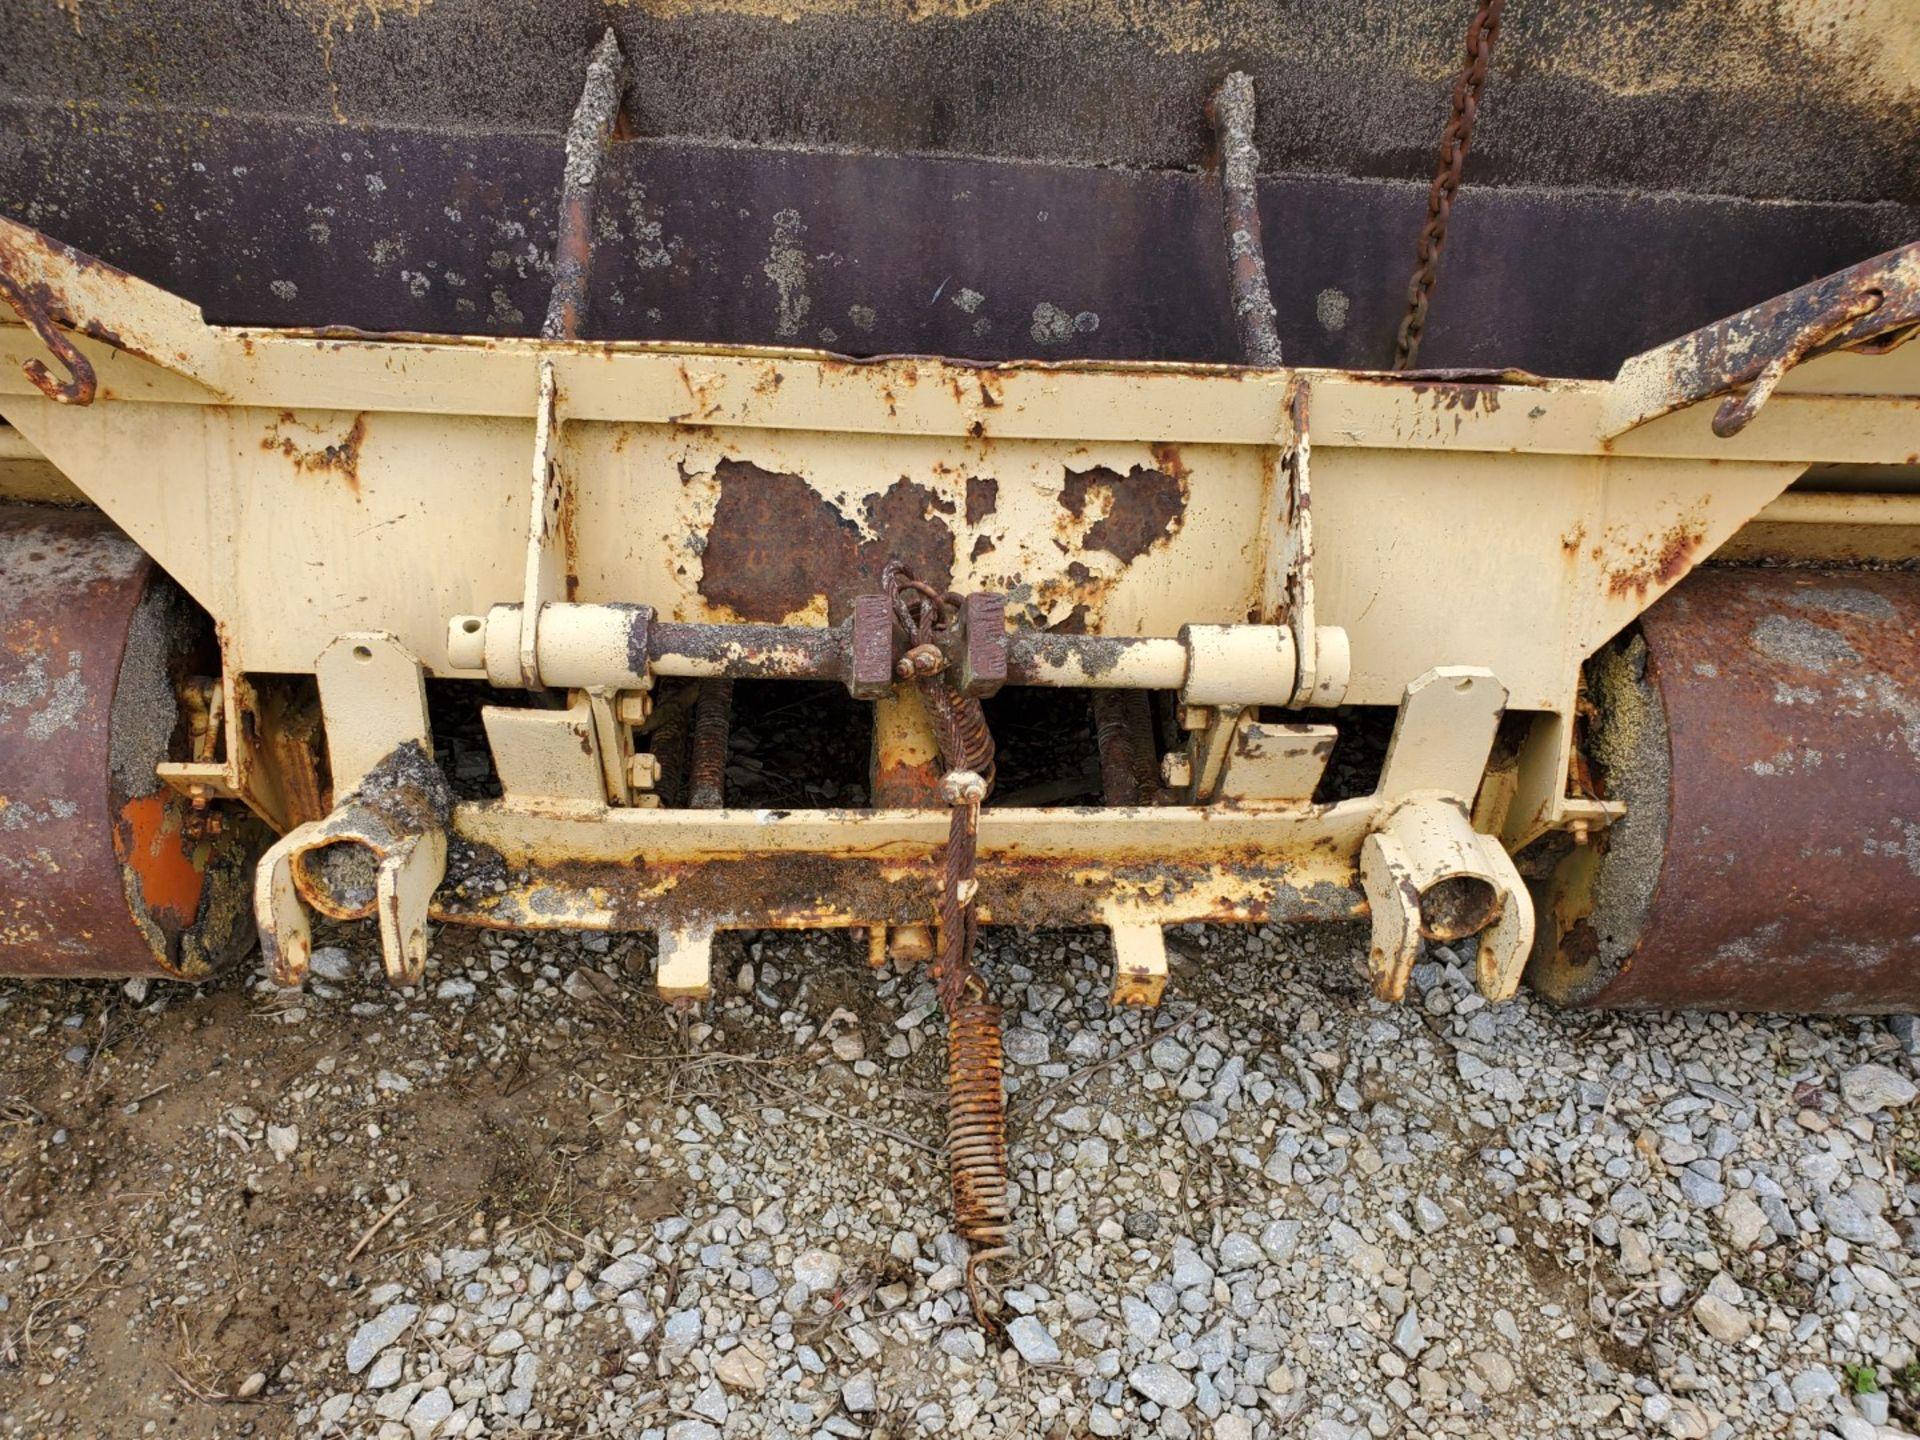 Lot 36 - Burch Model MPH-8-SP 8 ft Asphalt Box w/ 3- Point Hitch Mount